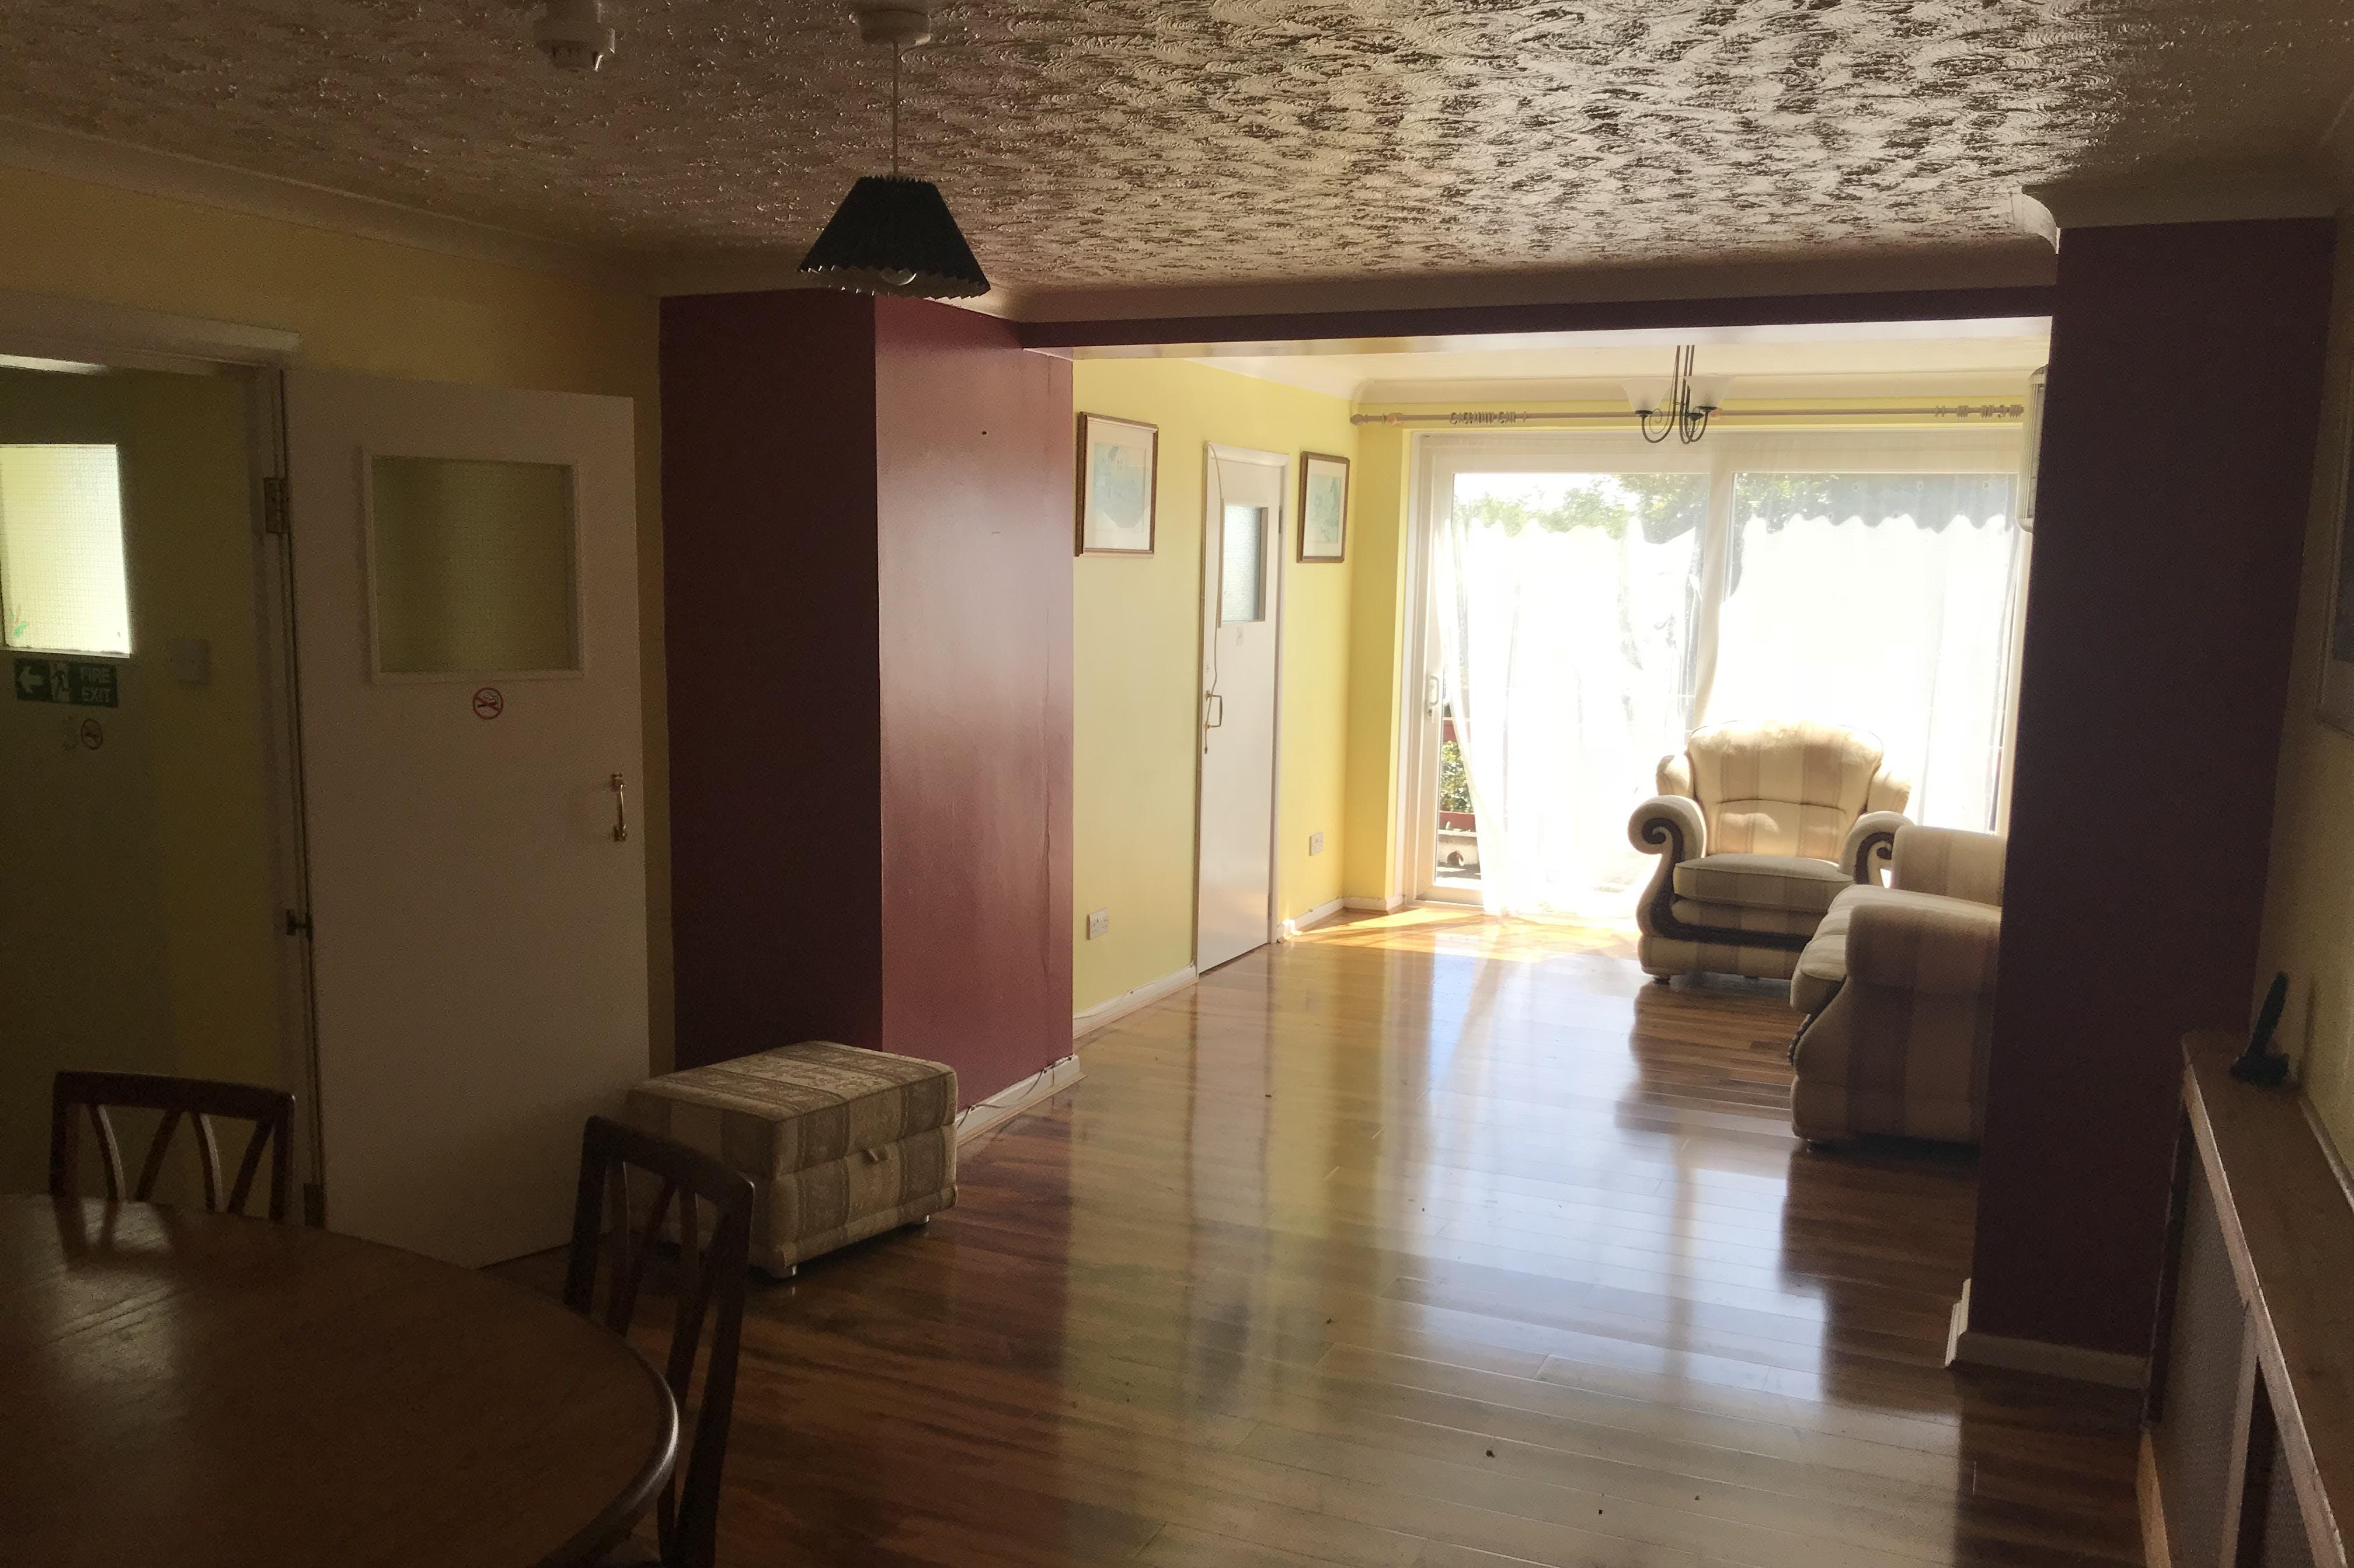 148 De La Warr Road, Bexhill On Sea, Residential For Sale - IMG_9604.JPG